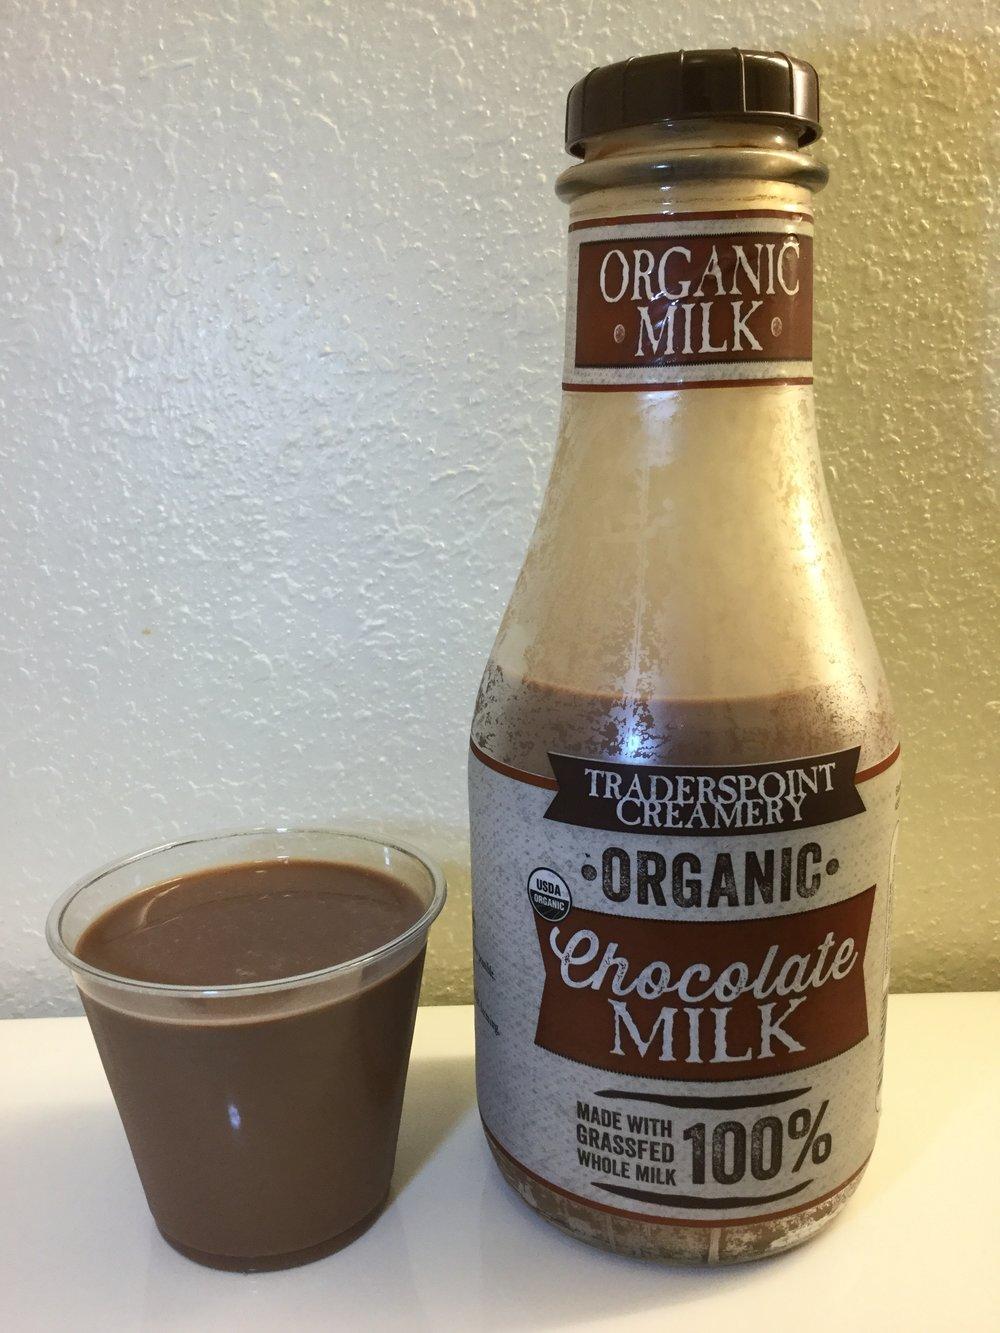 Traderspoint Creamery Organic Chocolate Milk Cup